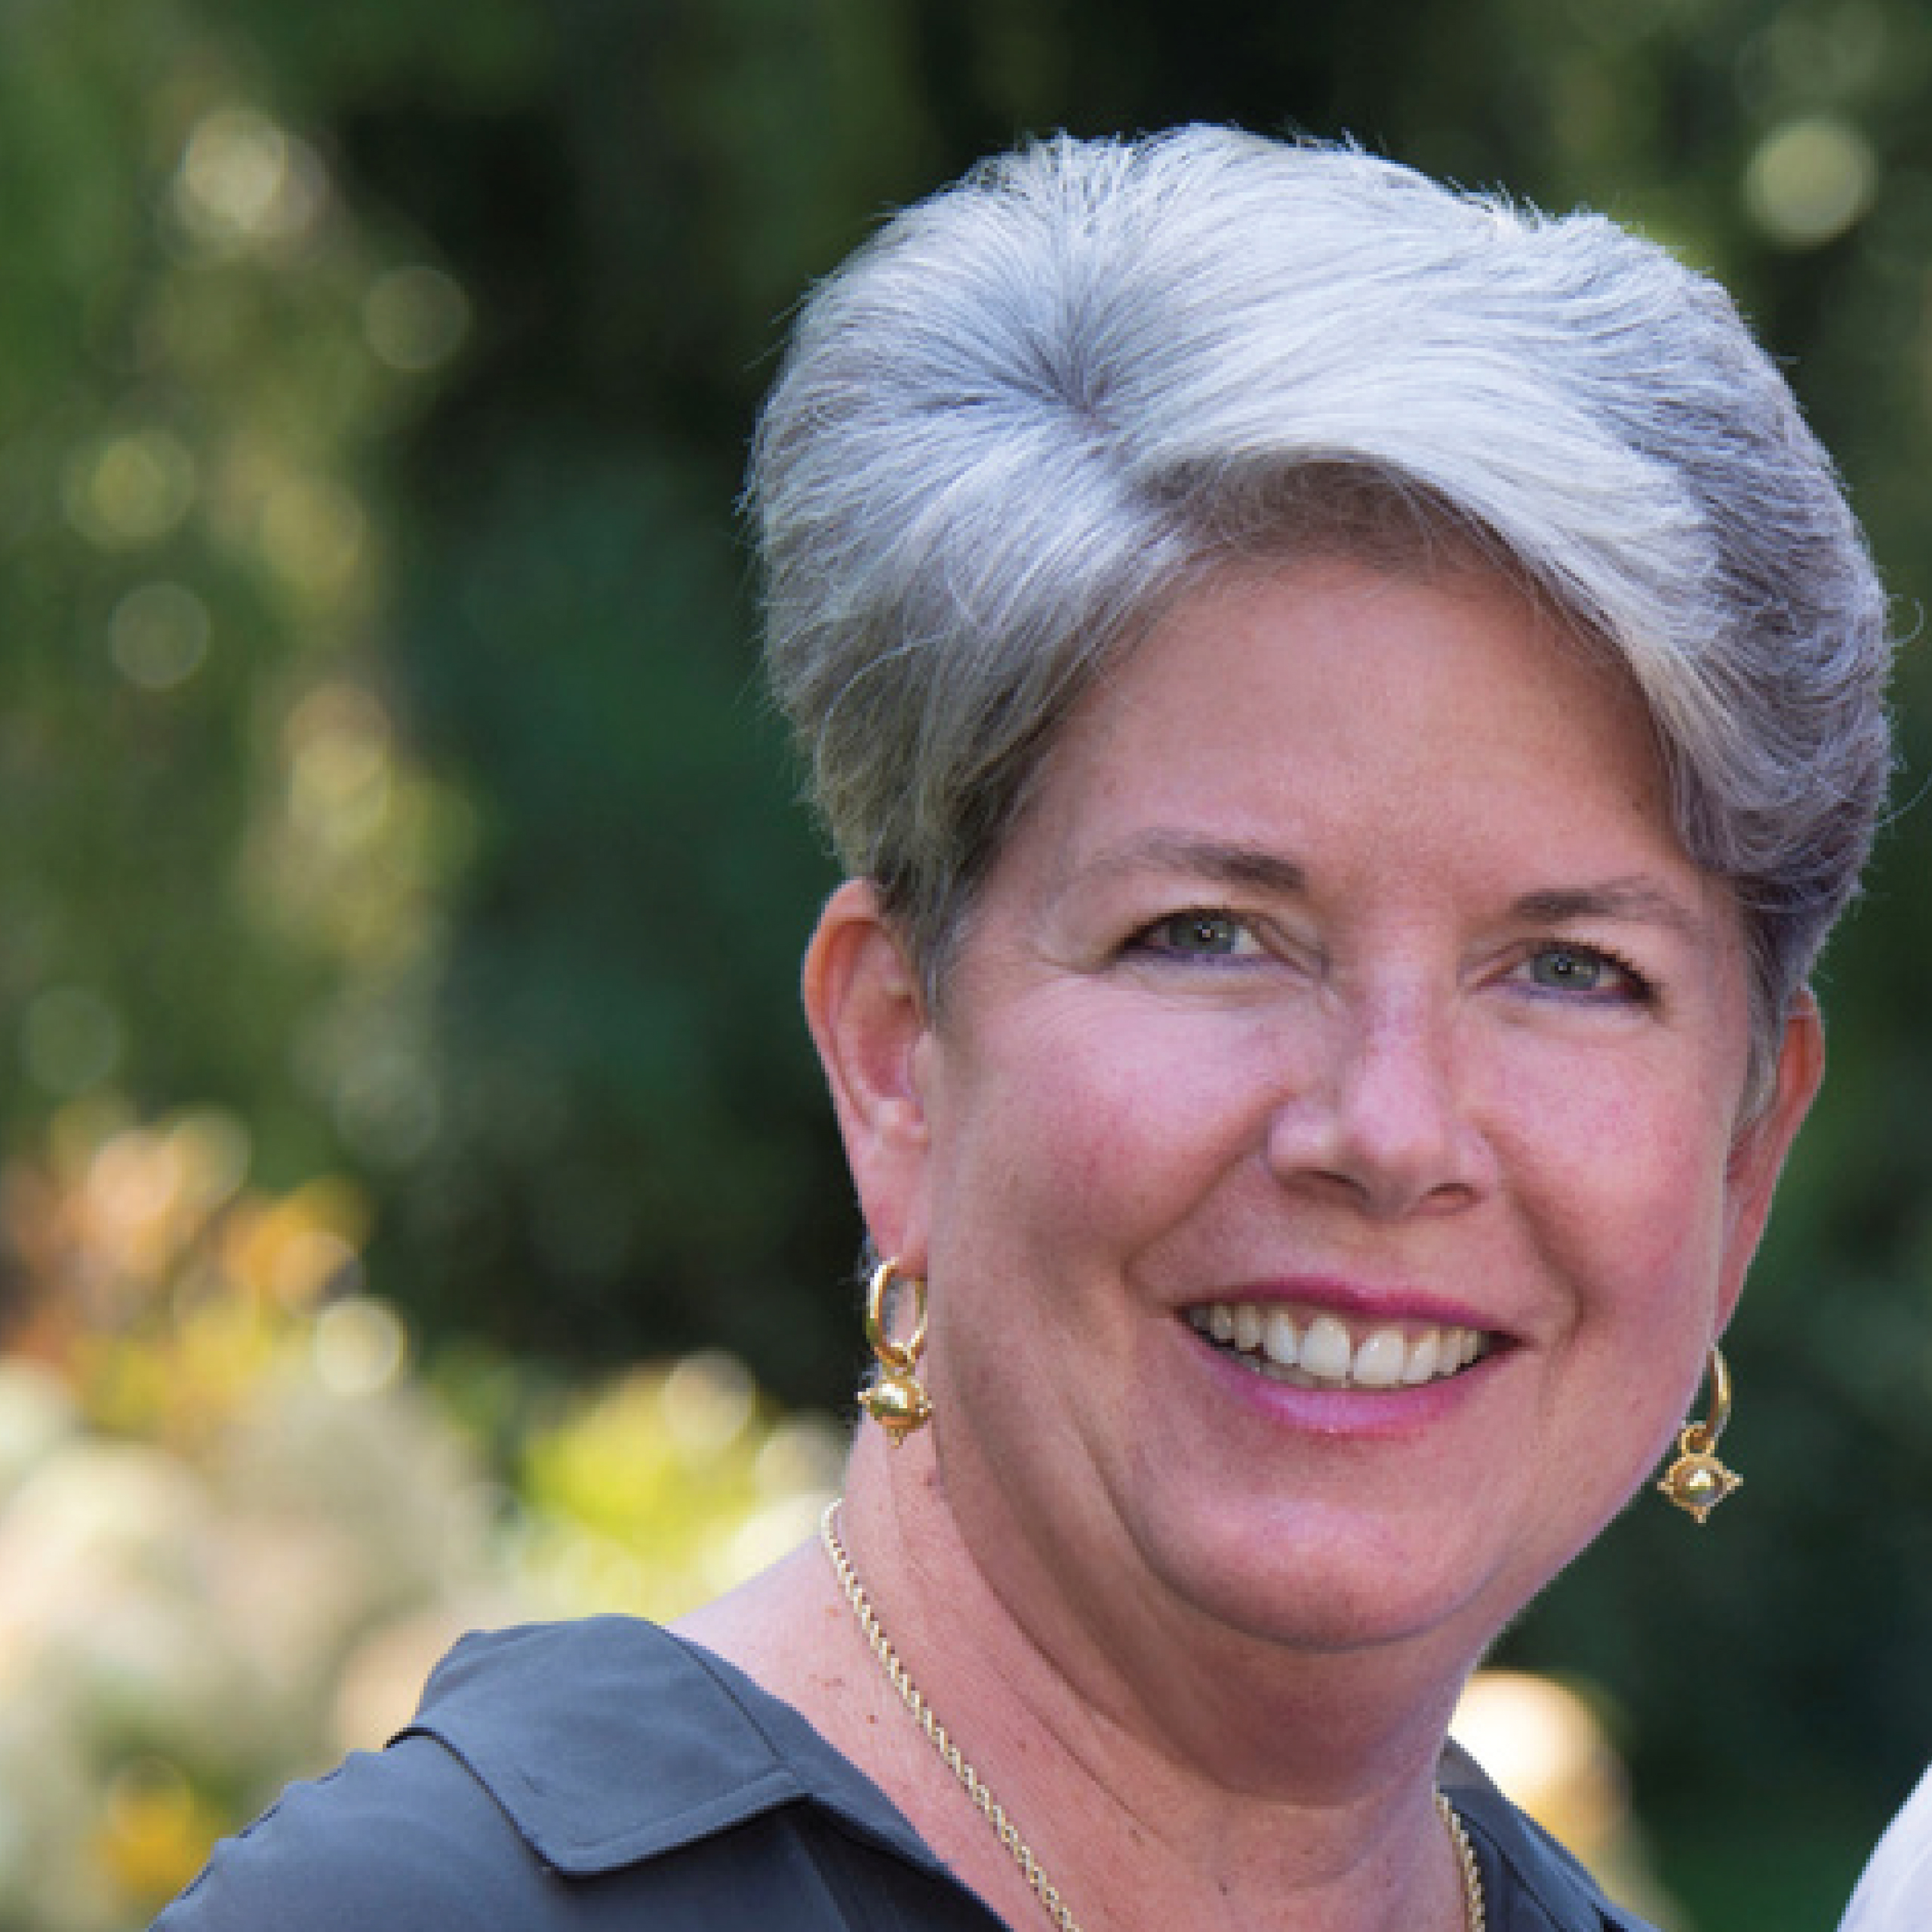 Carla Markell